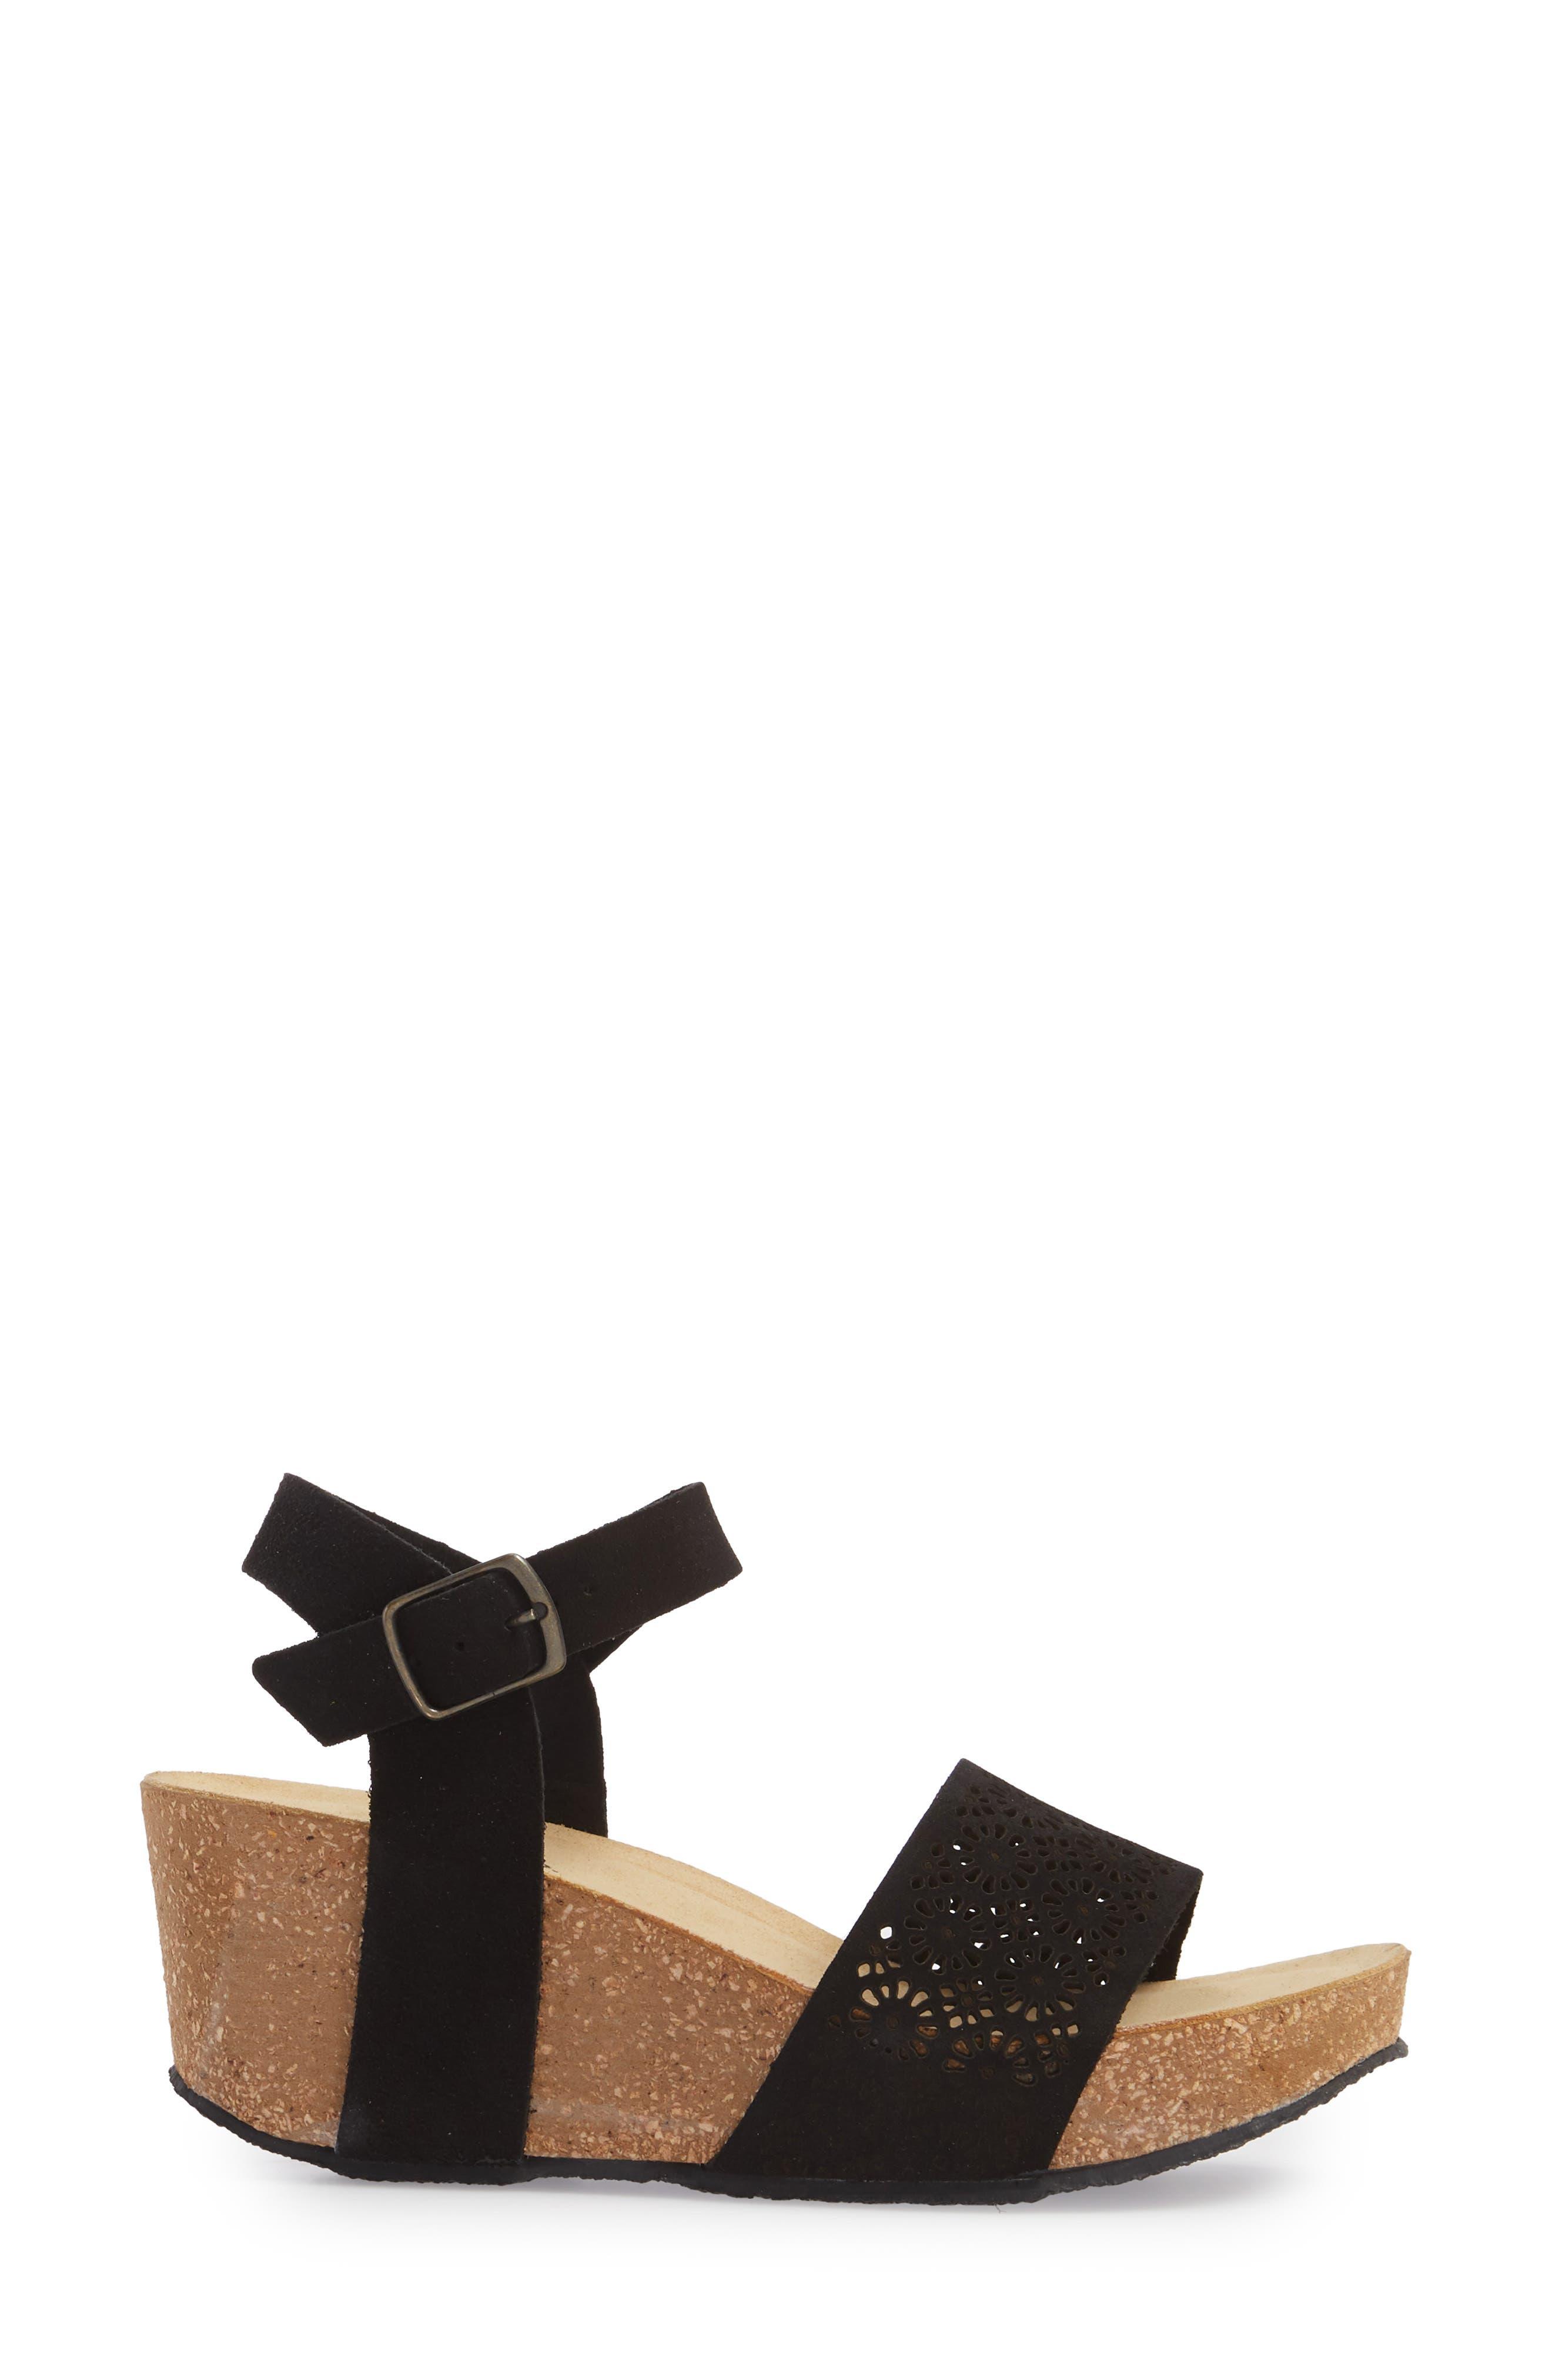 Lolo Platform Wedge Sandal,                             Alternate thumbnail 3, color,                             BLACK SUEDE